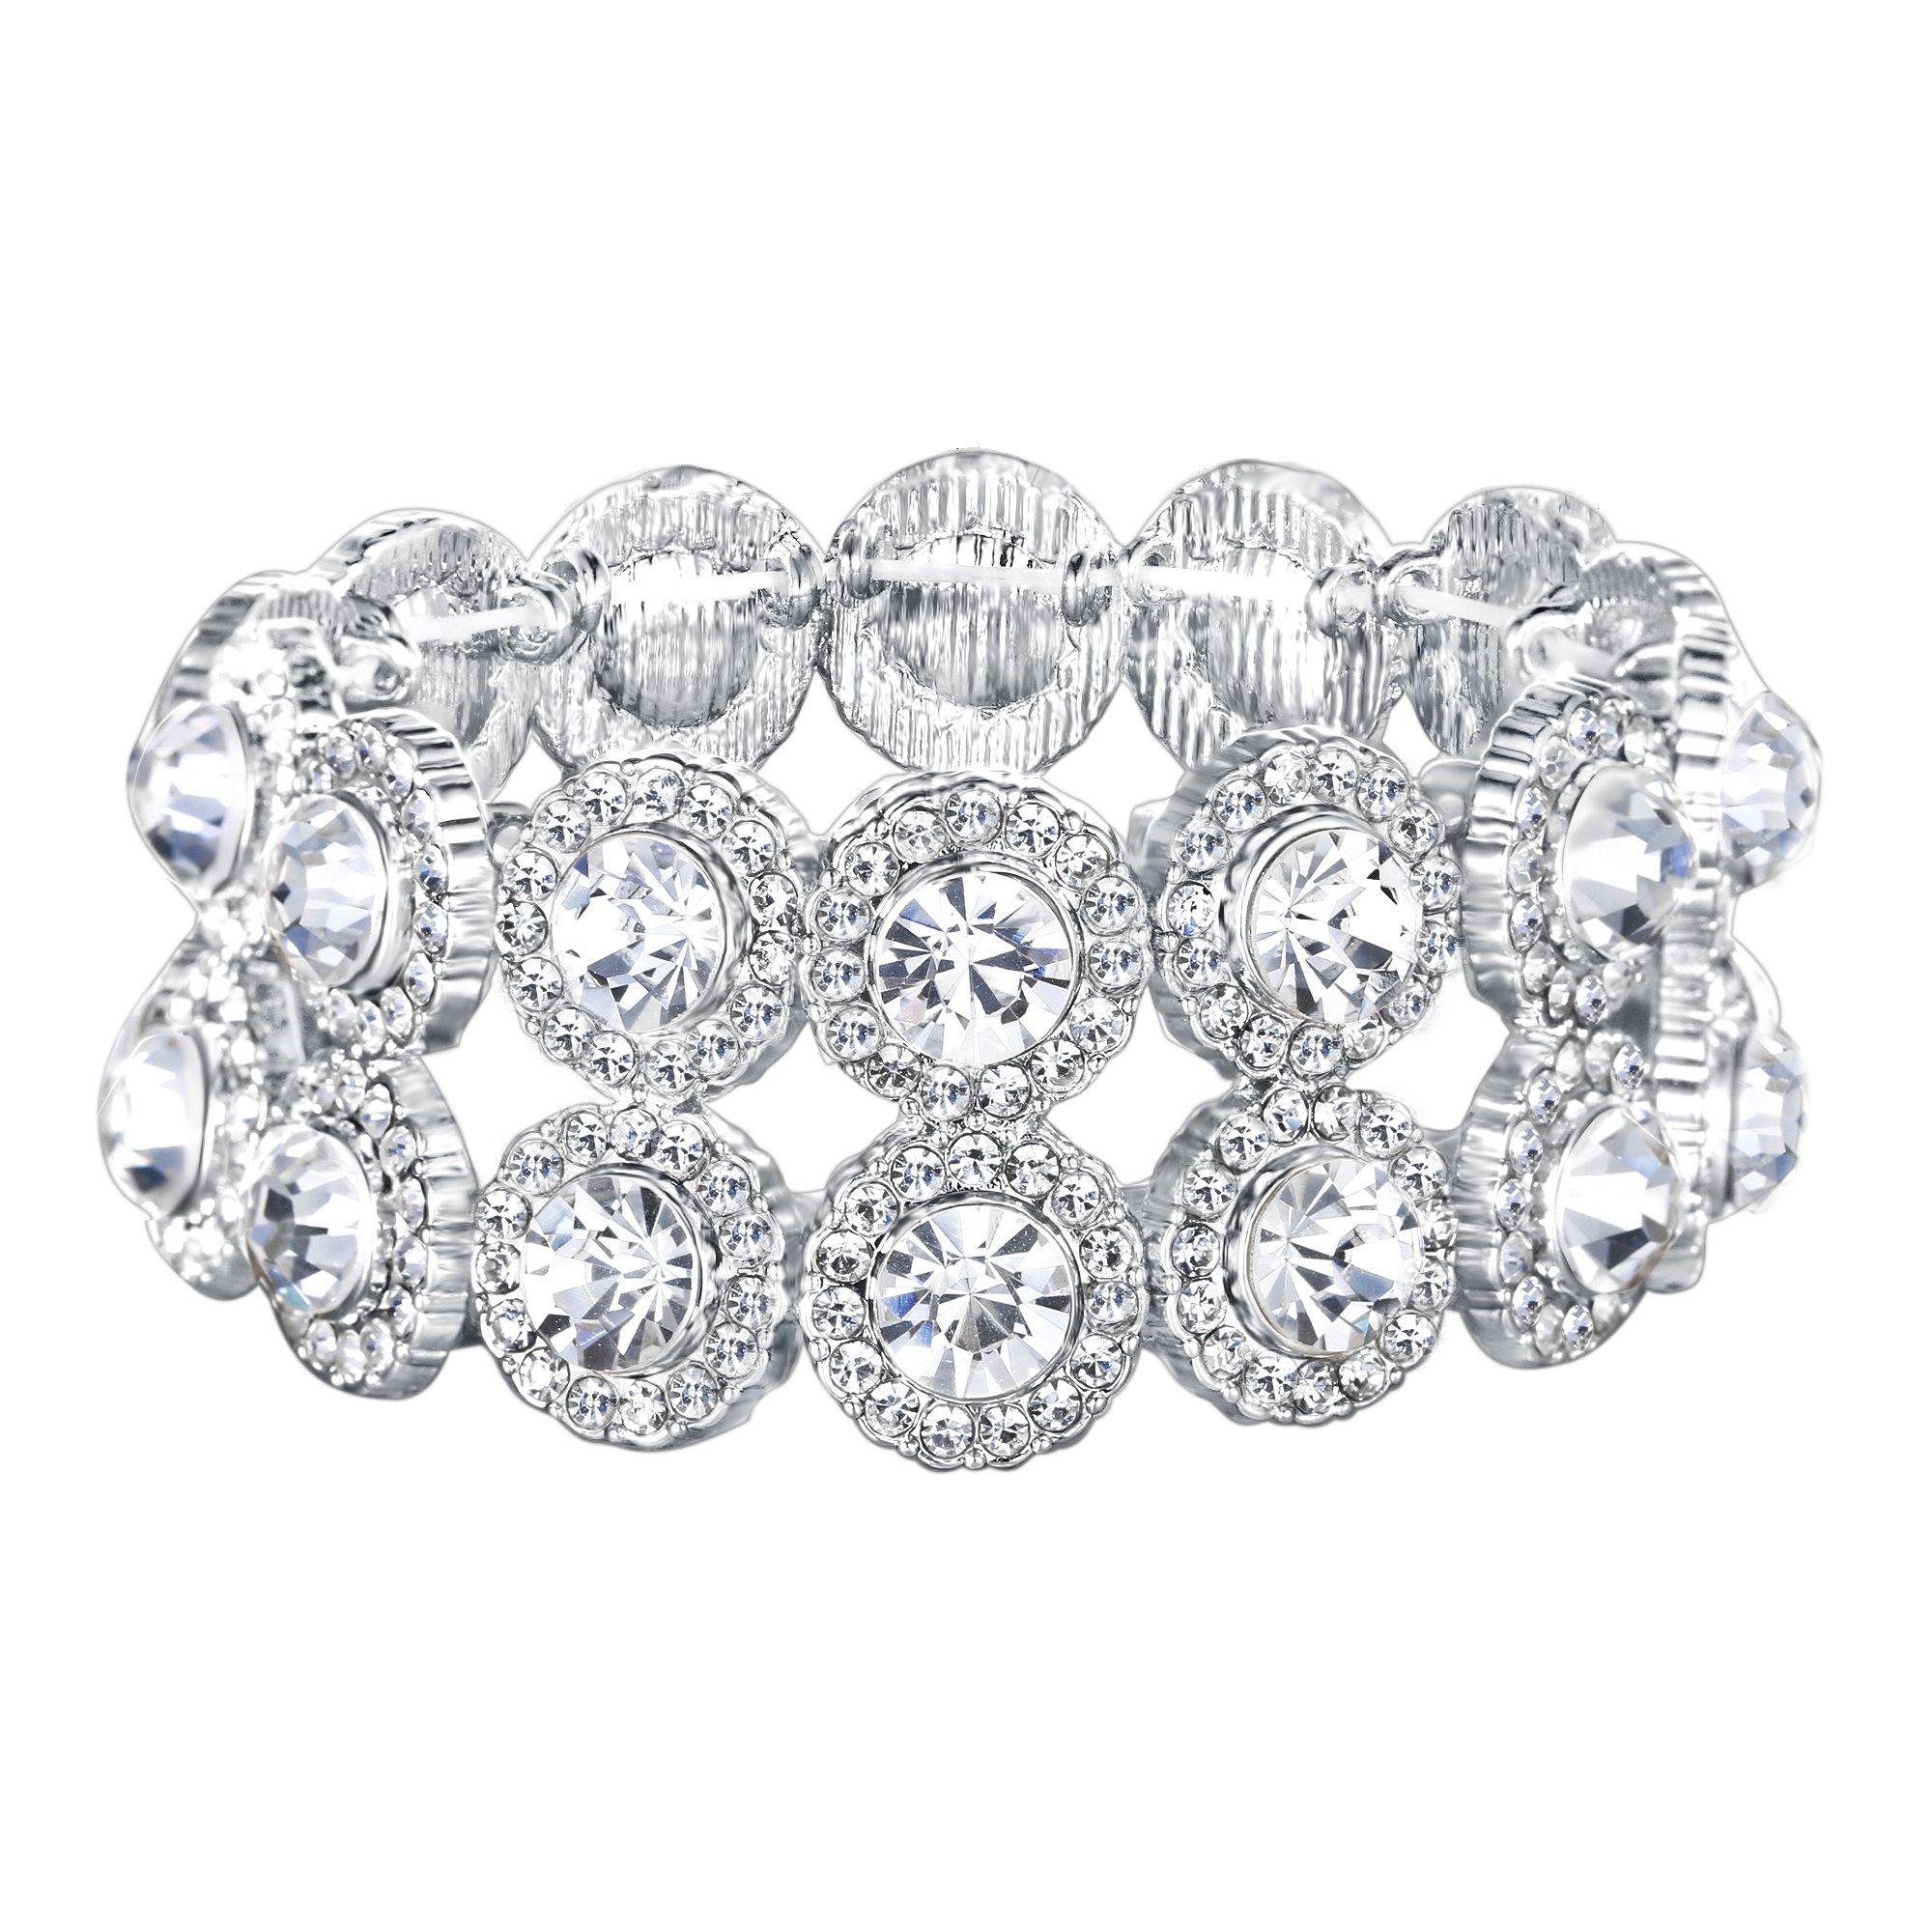 EVER FAITH Women's Austrian Crystal Bridal 2 Layers 8-Shaped Elastic Stretch Bracelet Clear Silver-Tone